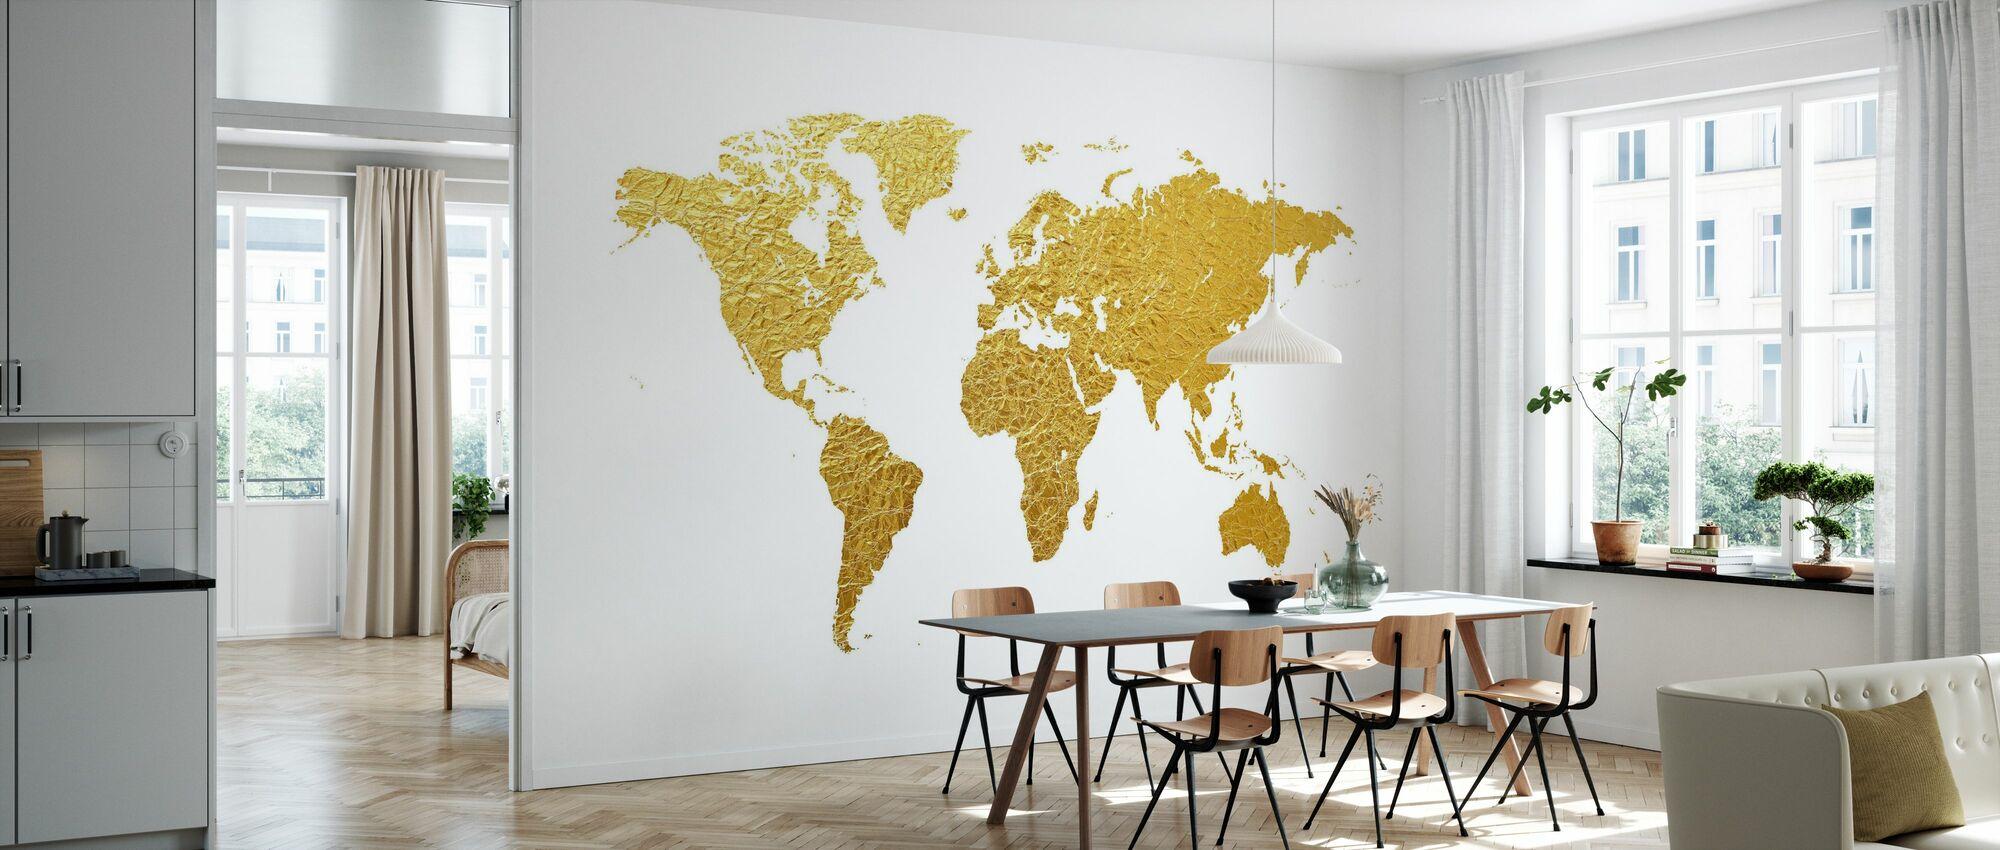 World Map Gold - Wallpaper - Kitchen